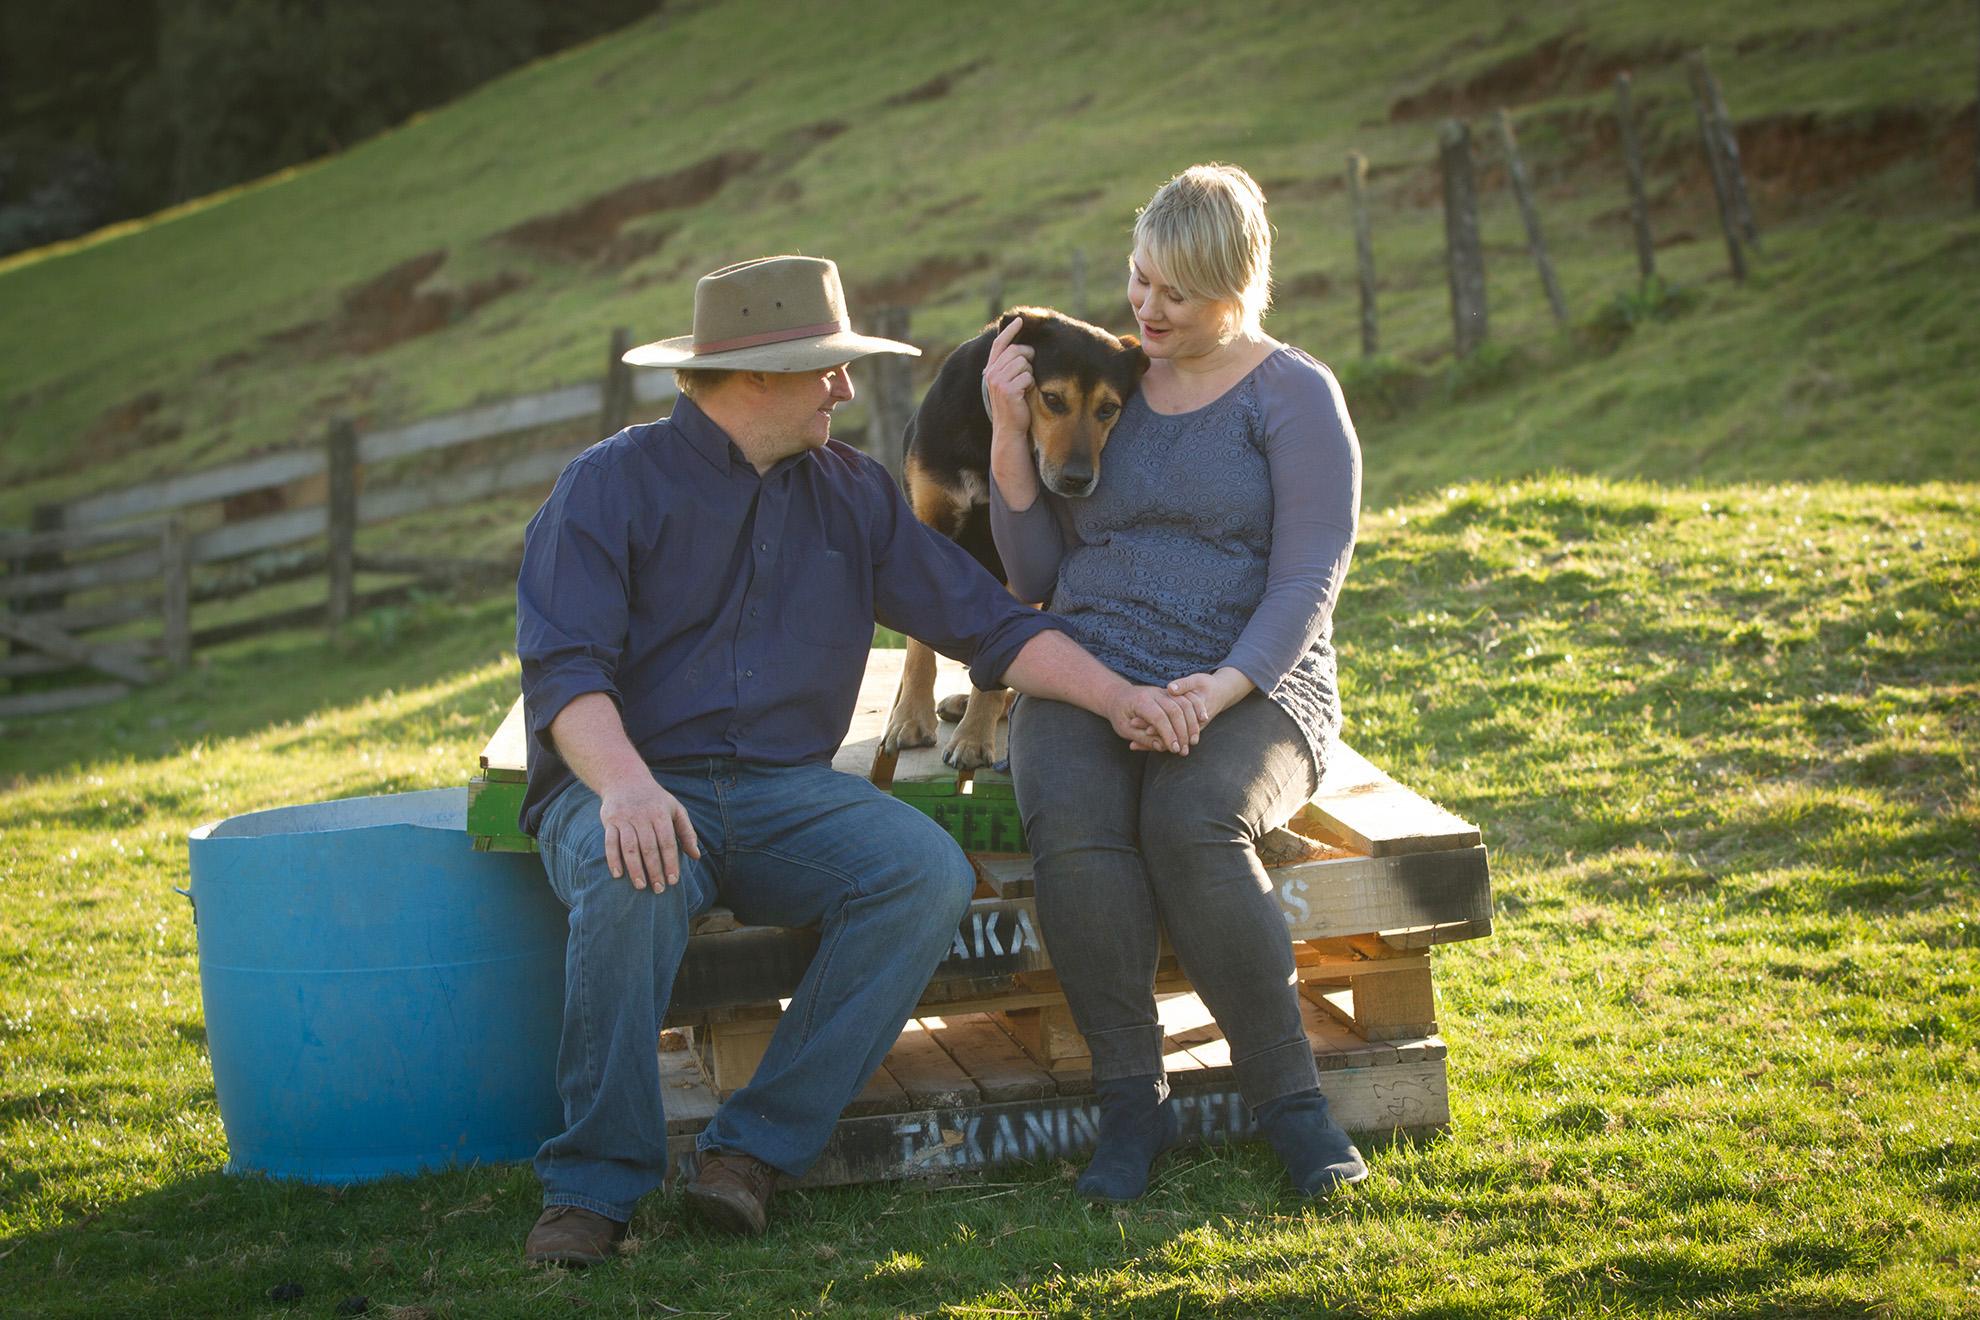 Hamilton-family-outdoors-lifestyle-photography.jpg